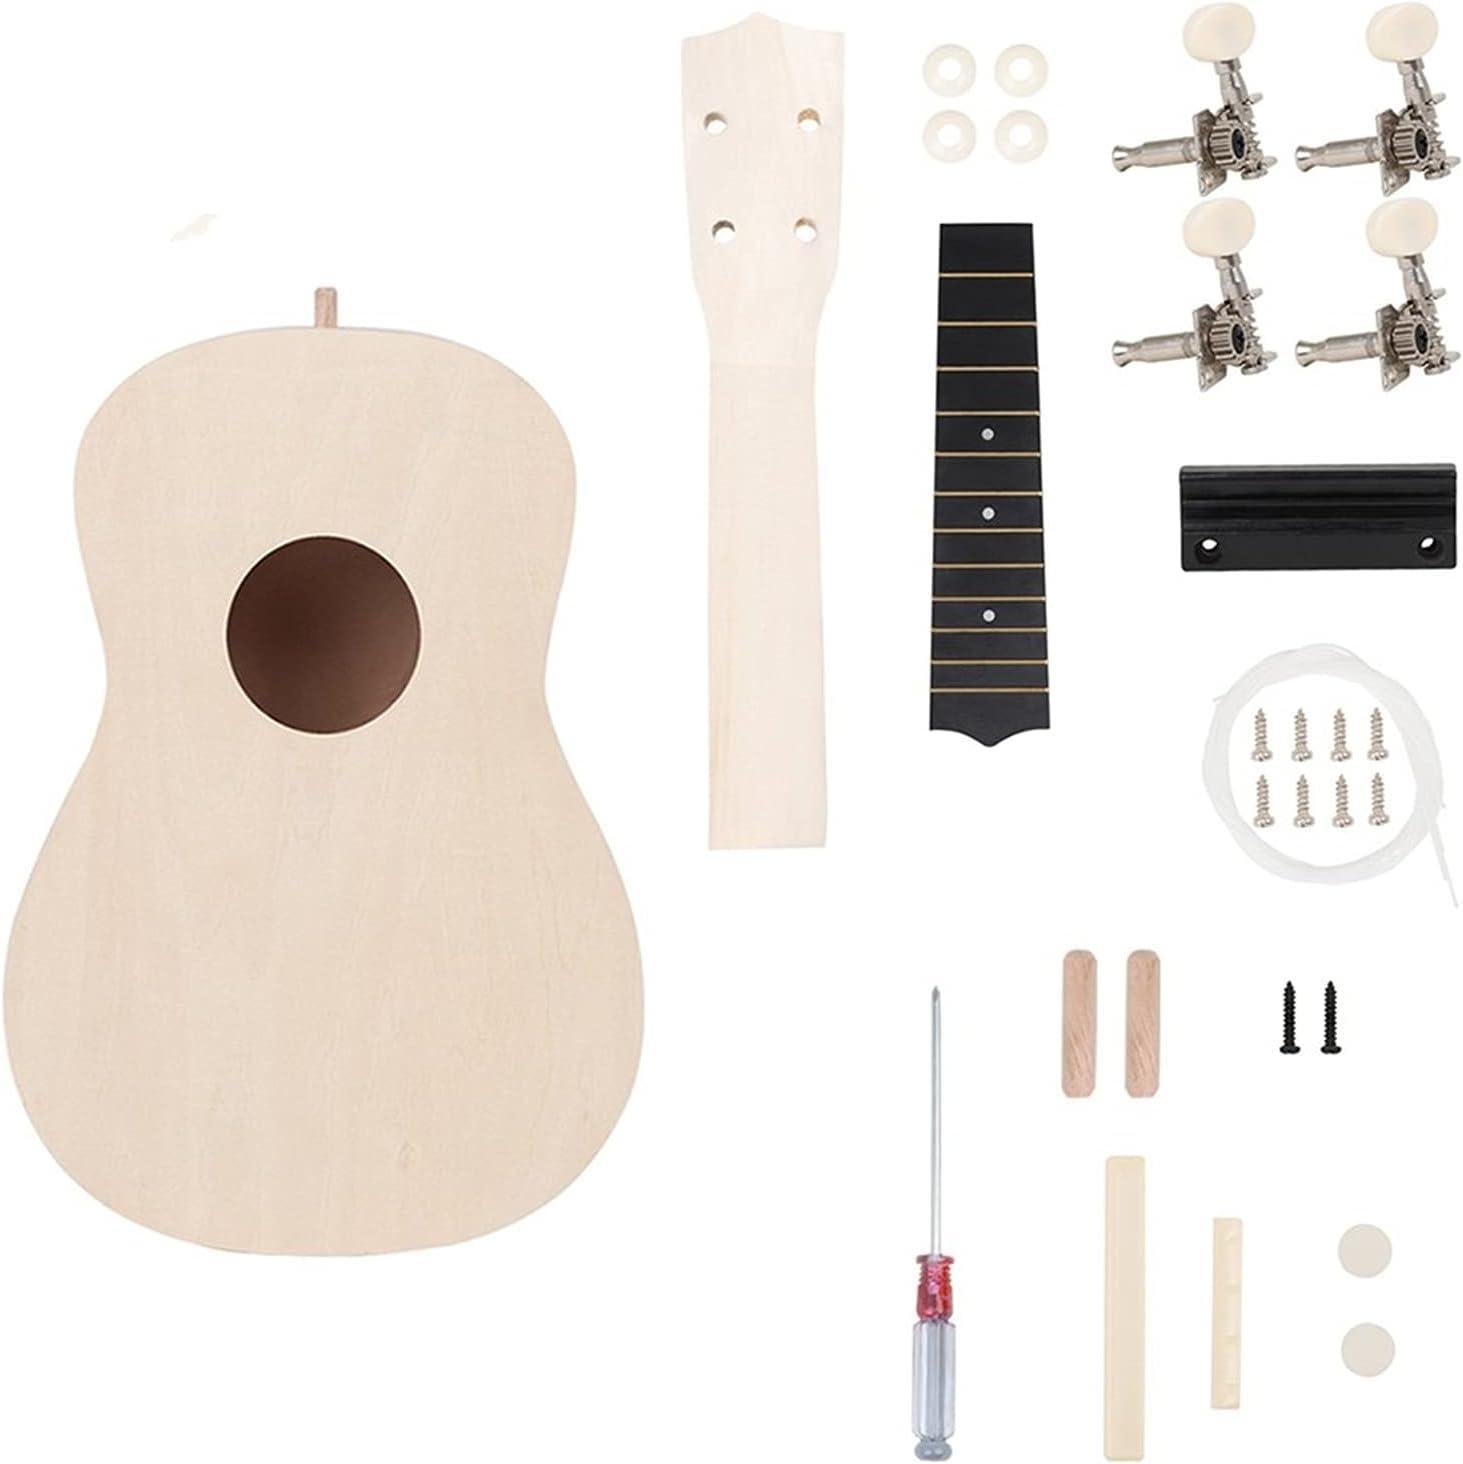 Ukuleles 21 Inch Ukulele DIY Guitar Kit Painting Award 4-String Hawaii Max 71% OFF